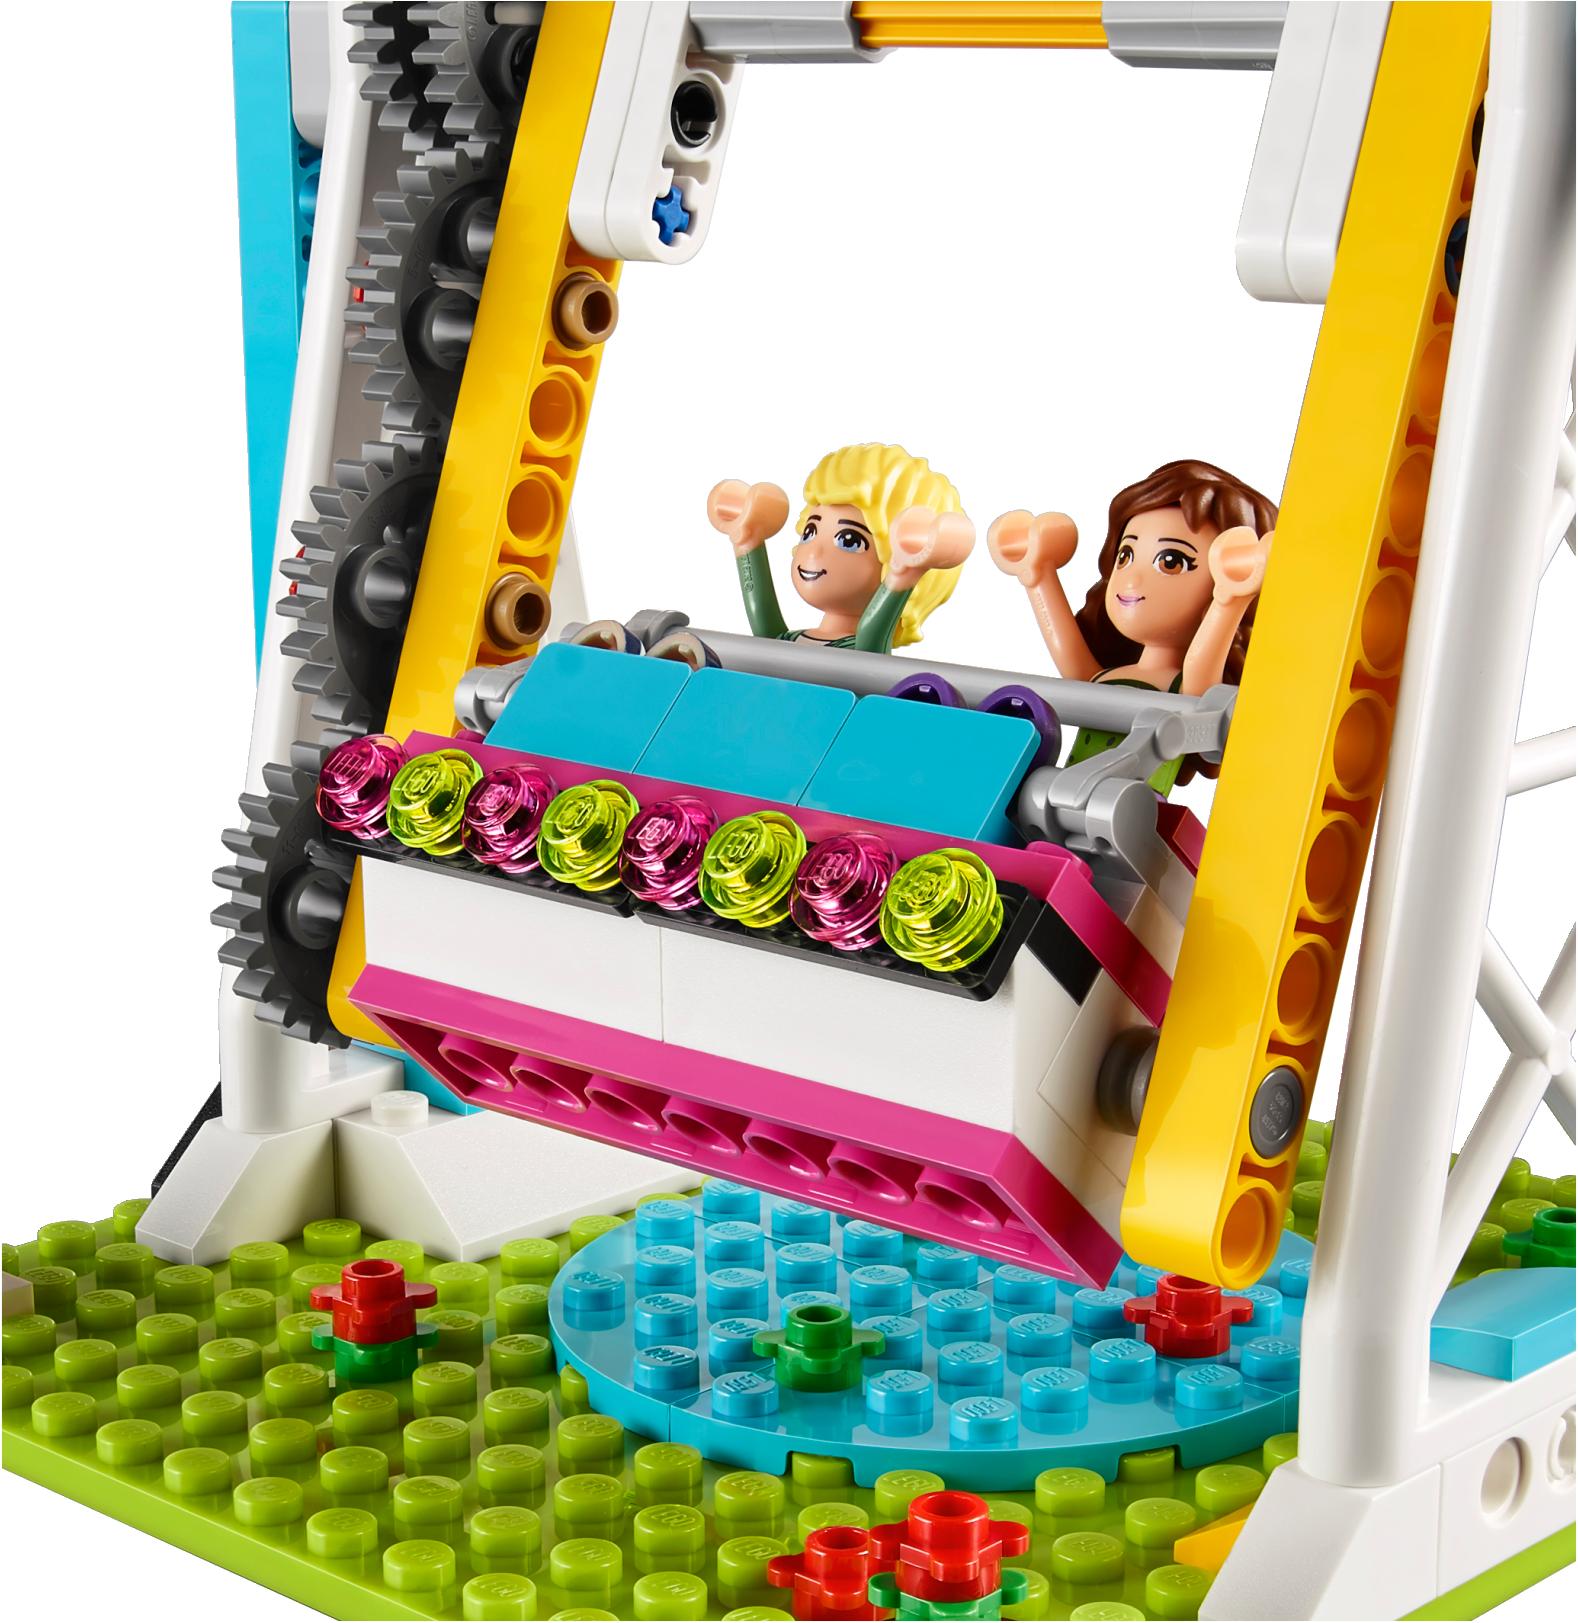 Amusement Park Bumper Cars